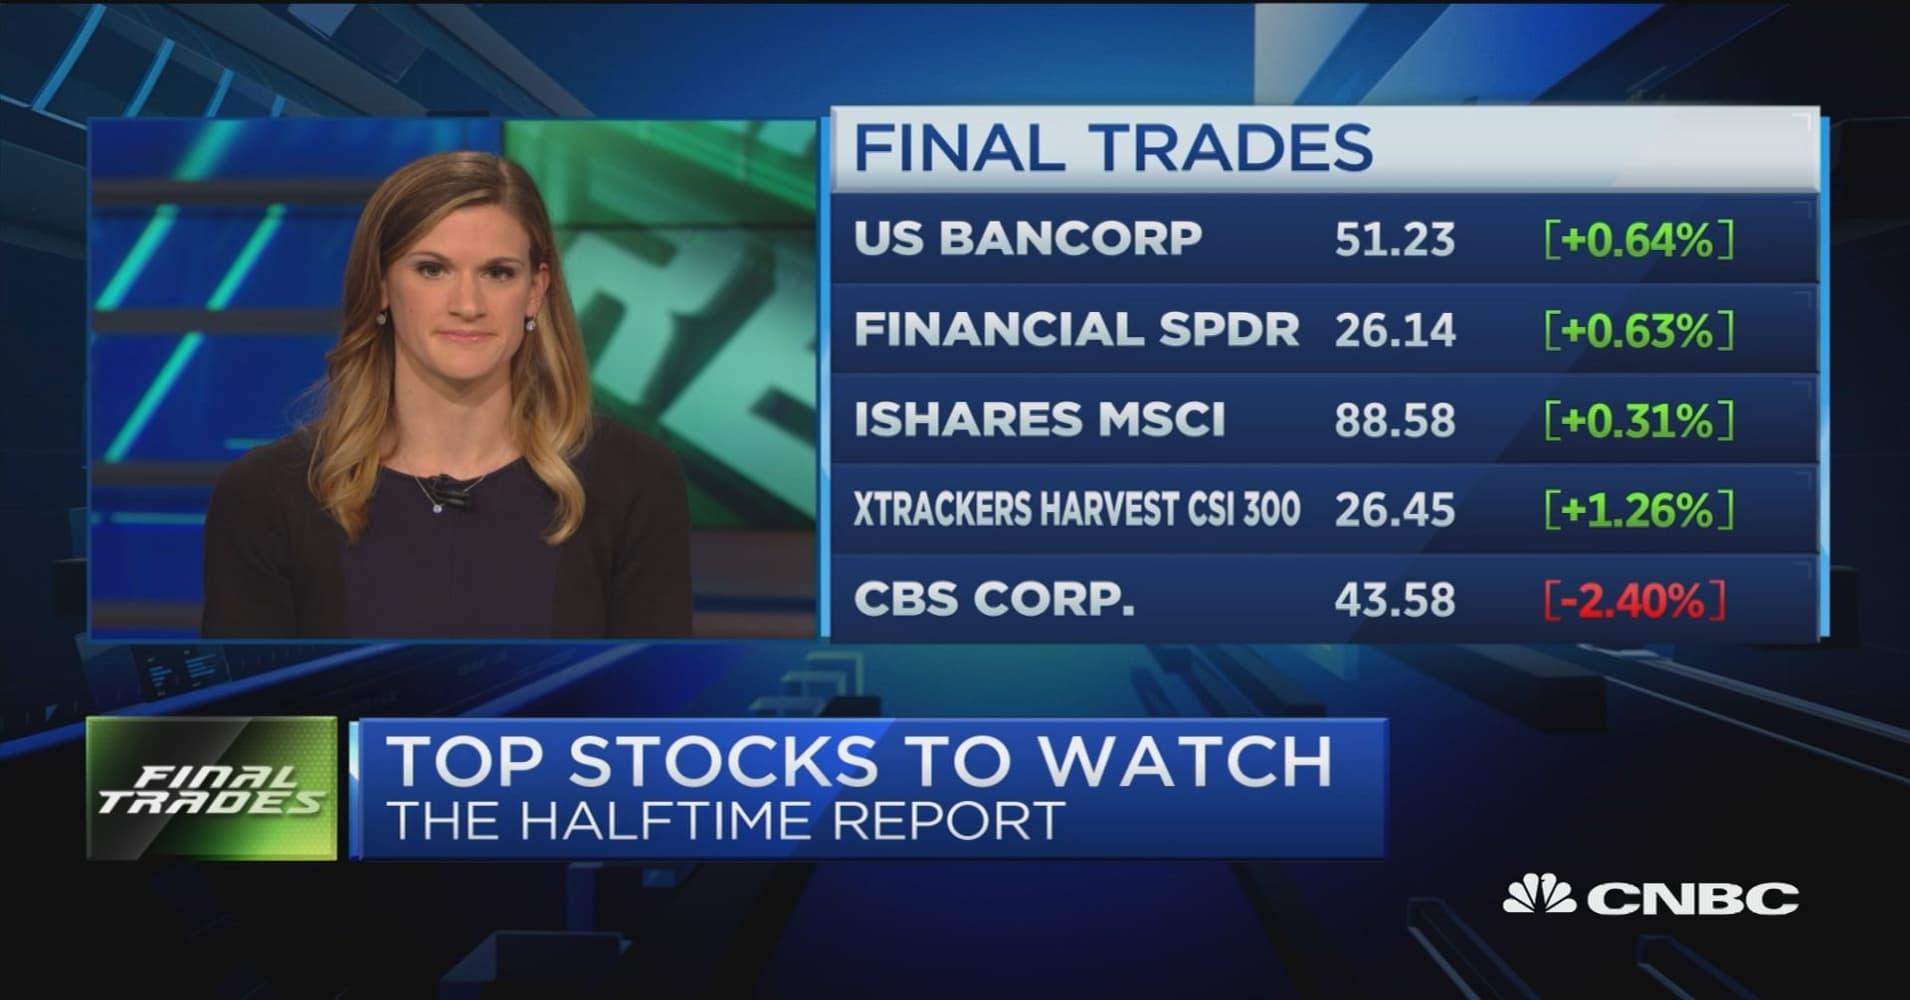 Final Trades: US Bancorp, Financials, CBS and more